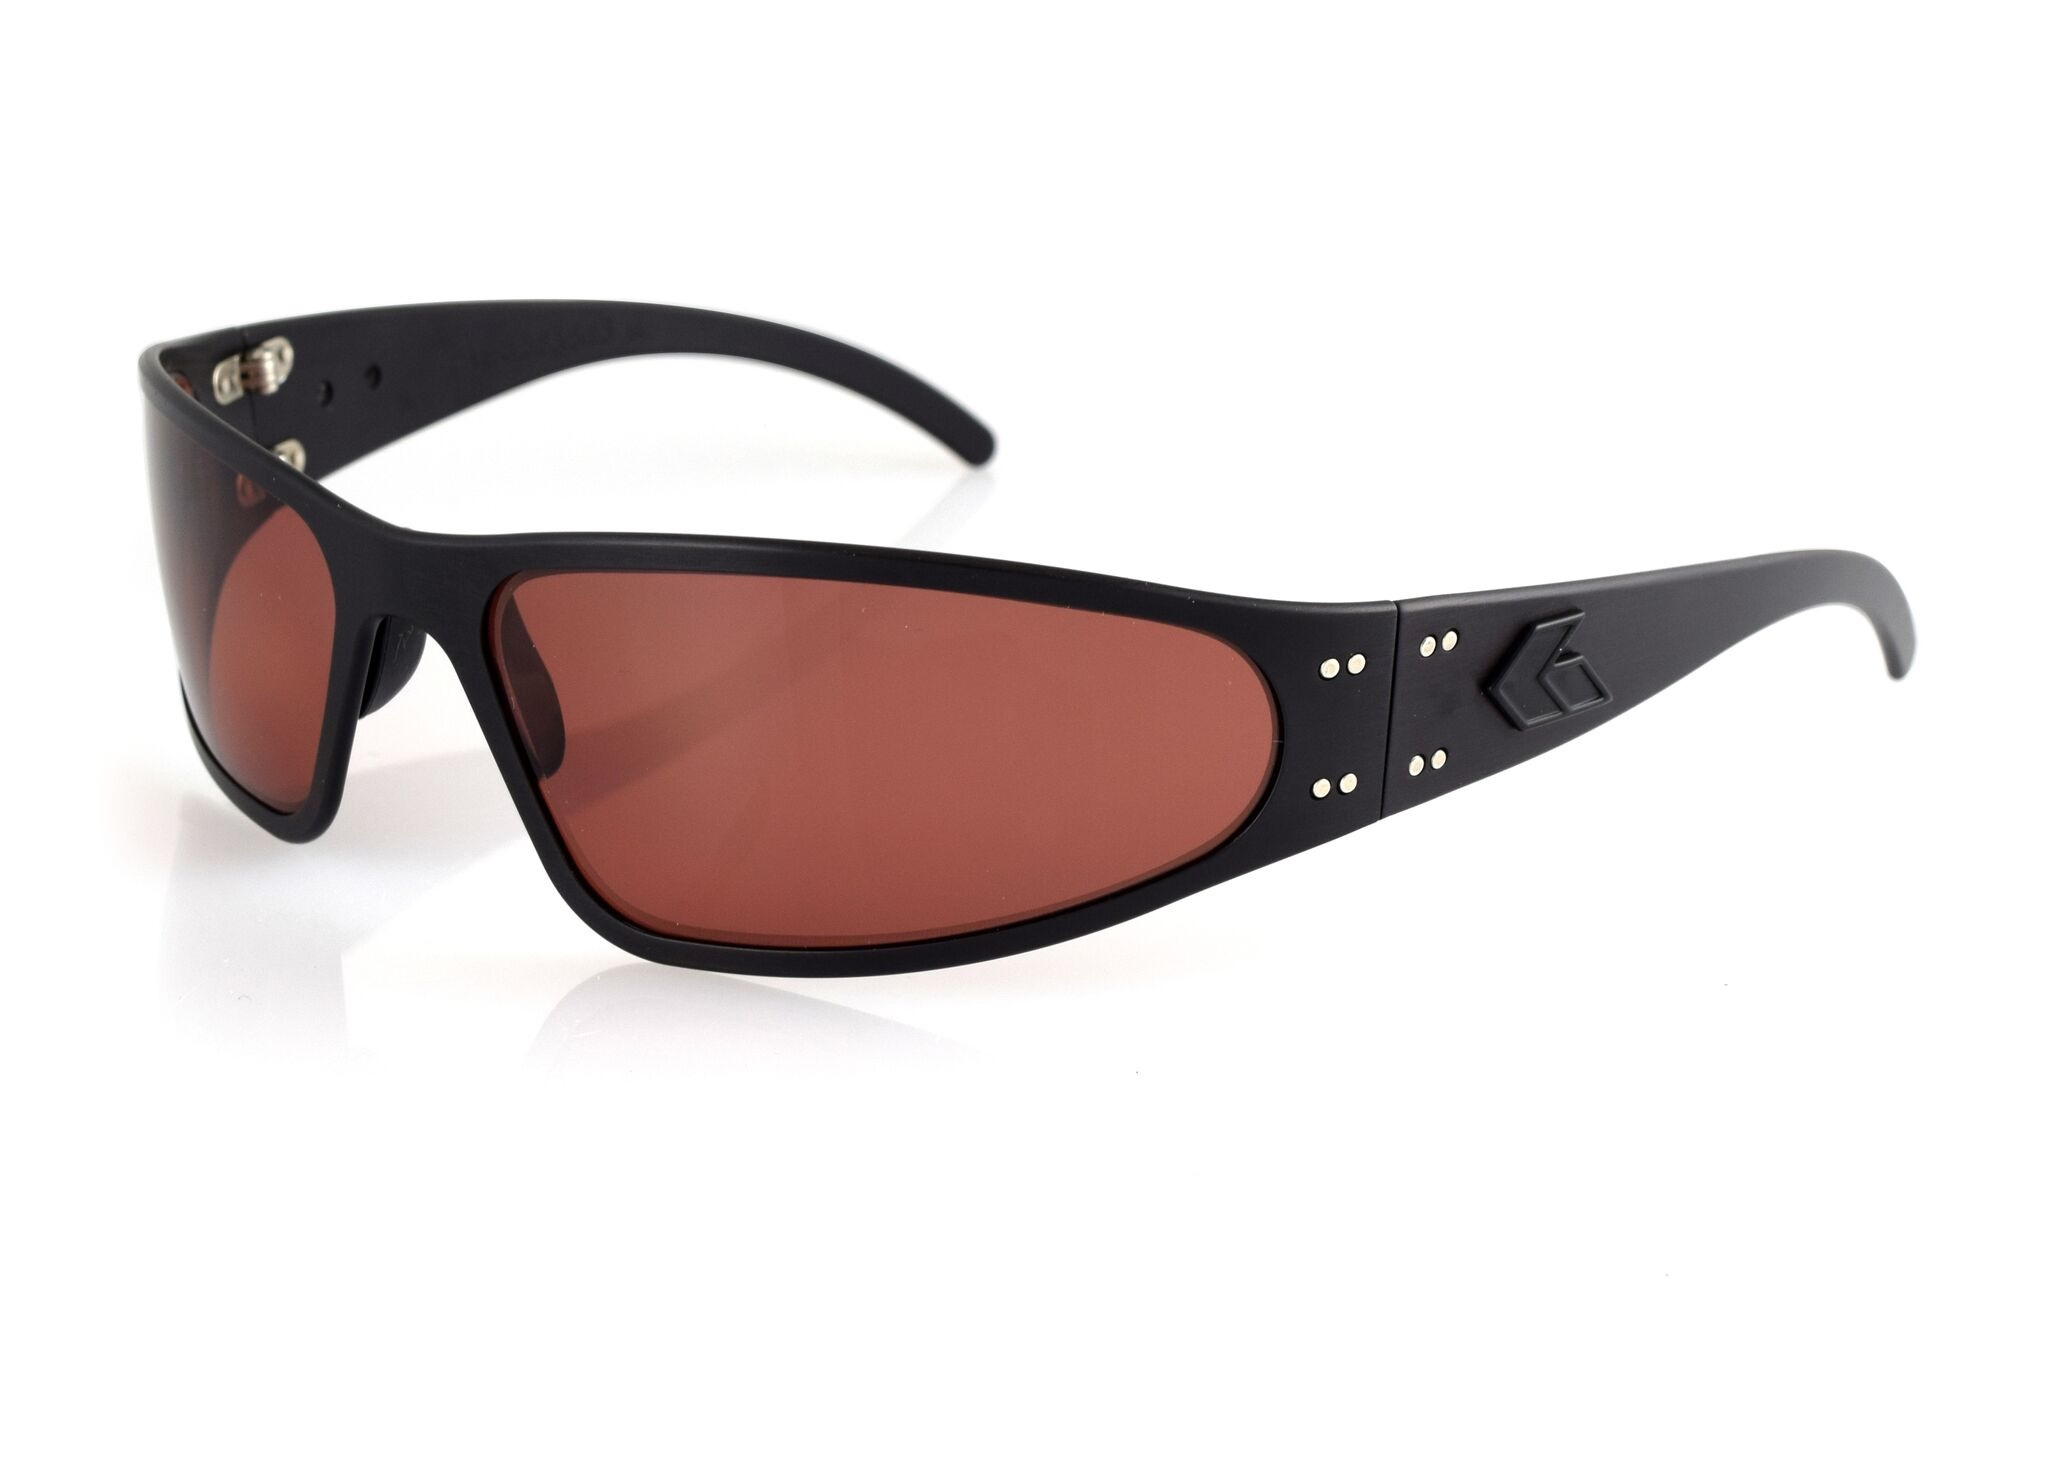 fbf61ed7681 NEW Gatorz WRAMBP09P Wraptor Blackout Frame Sunglasses w  Rose Polarized  Lens